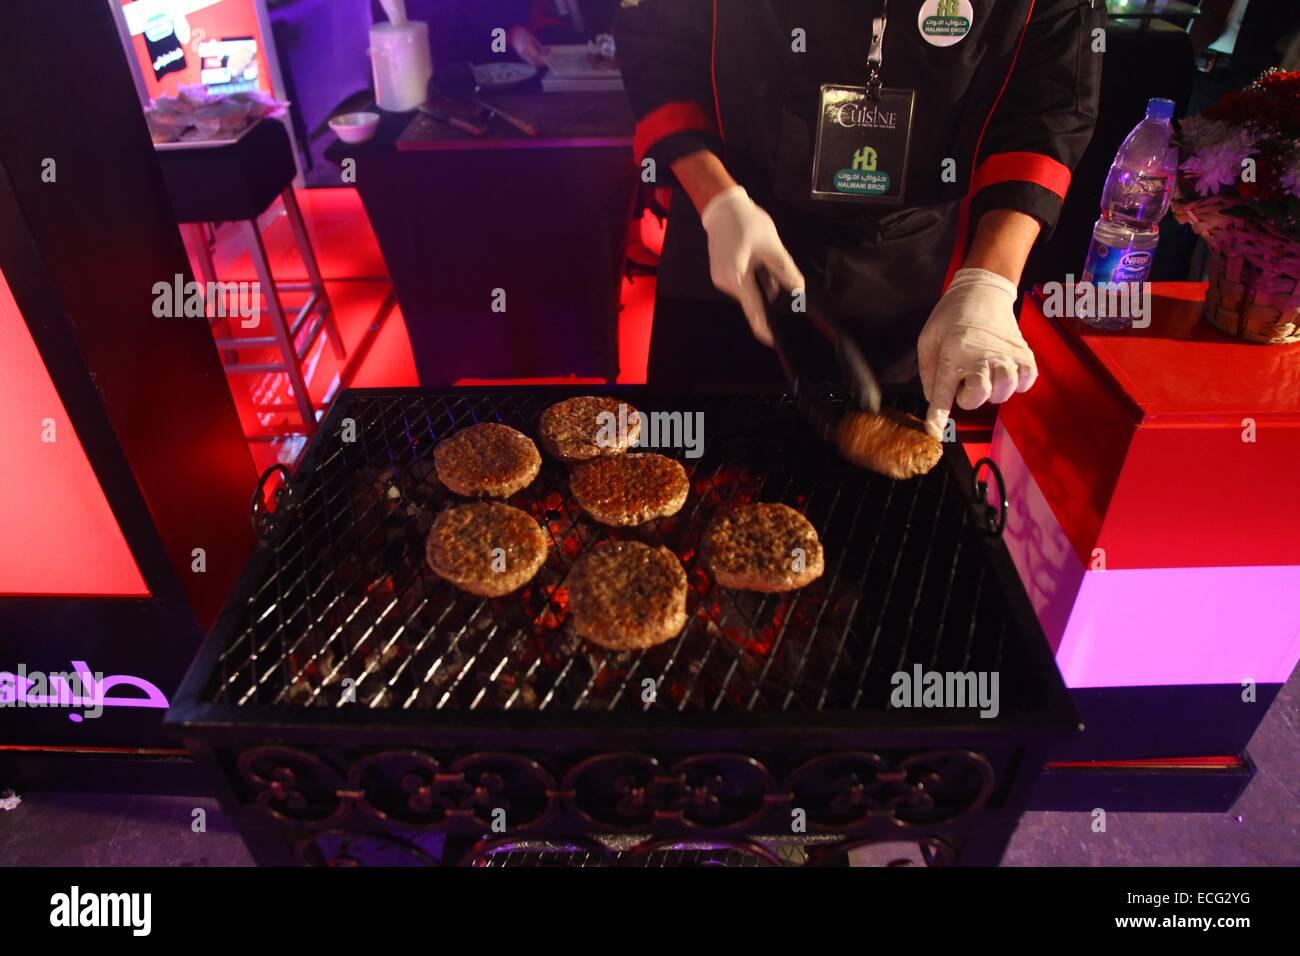 Chef Cooking Burgers Stockfotos & Chef Cooking Burgers Bilder - Alamy